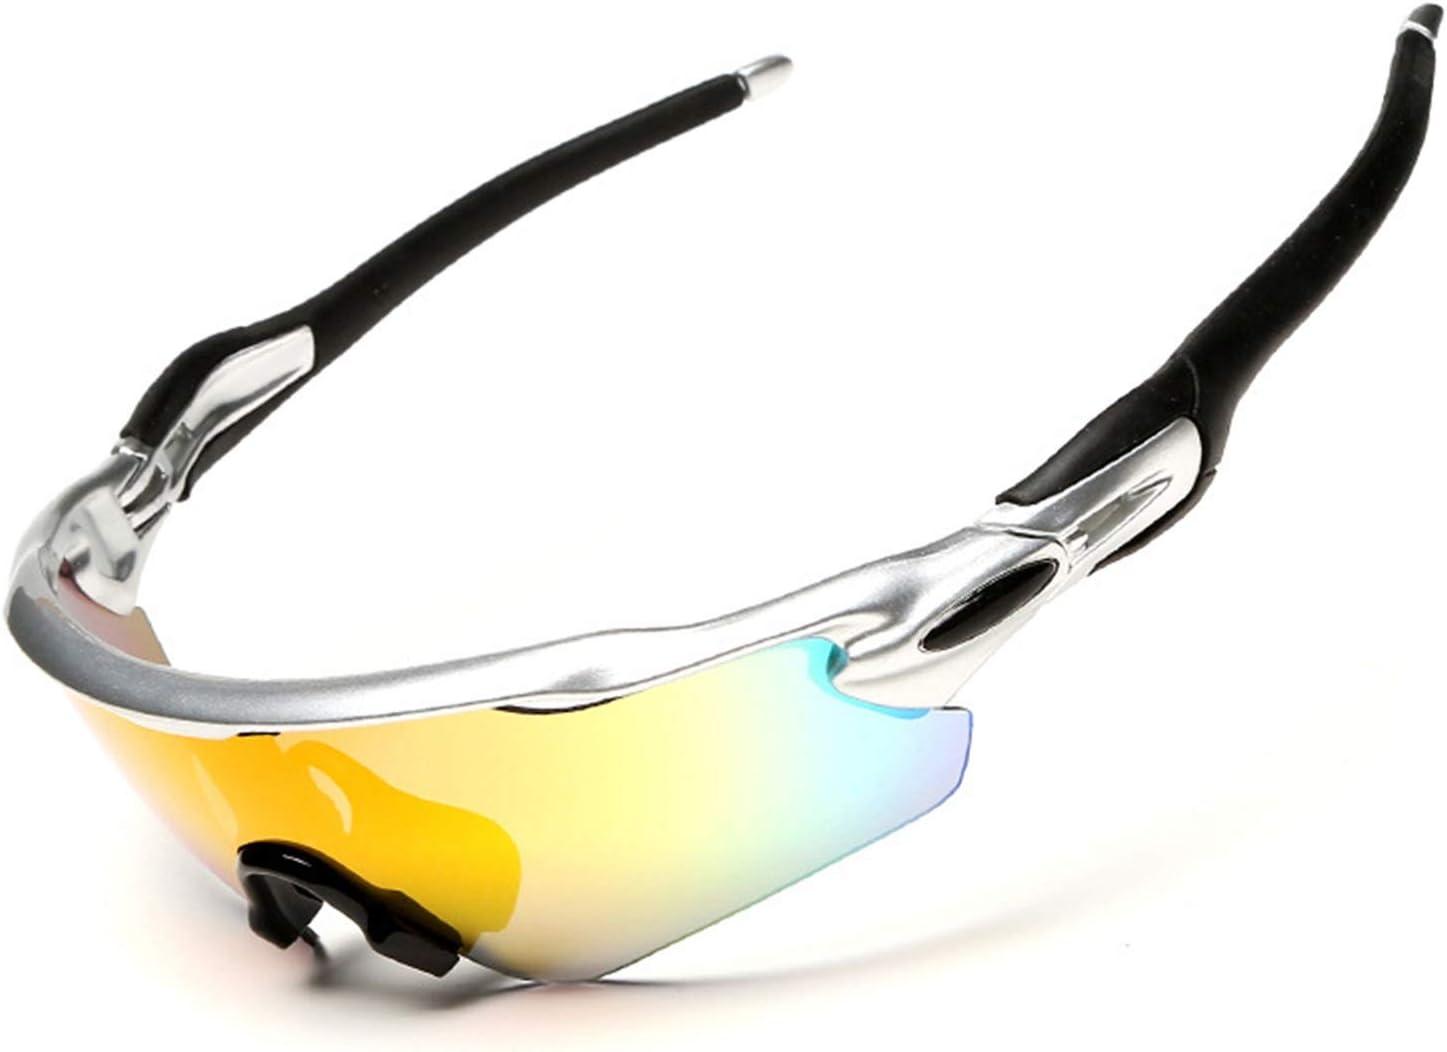 Blisfille Gafas Proteccion Buzo Gafas Deporte Chica,A01-Q